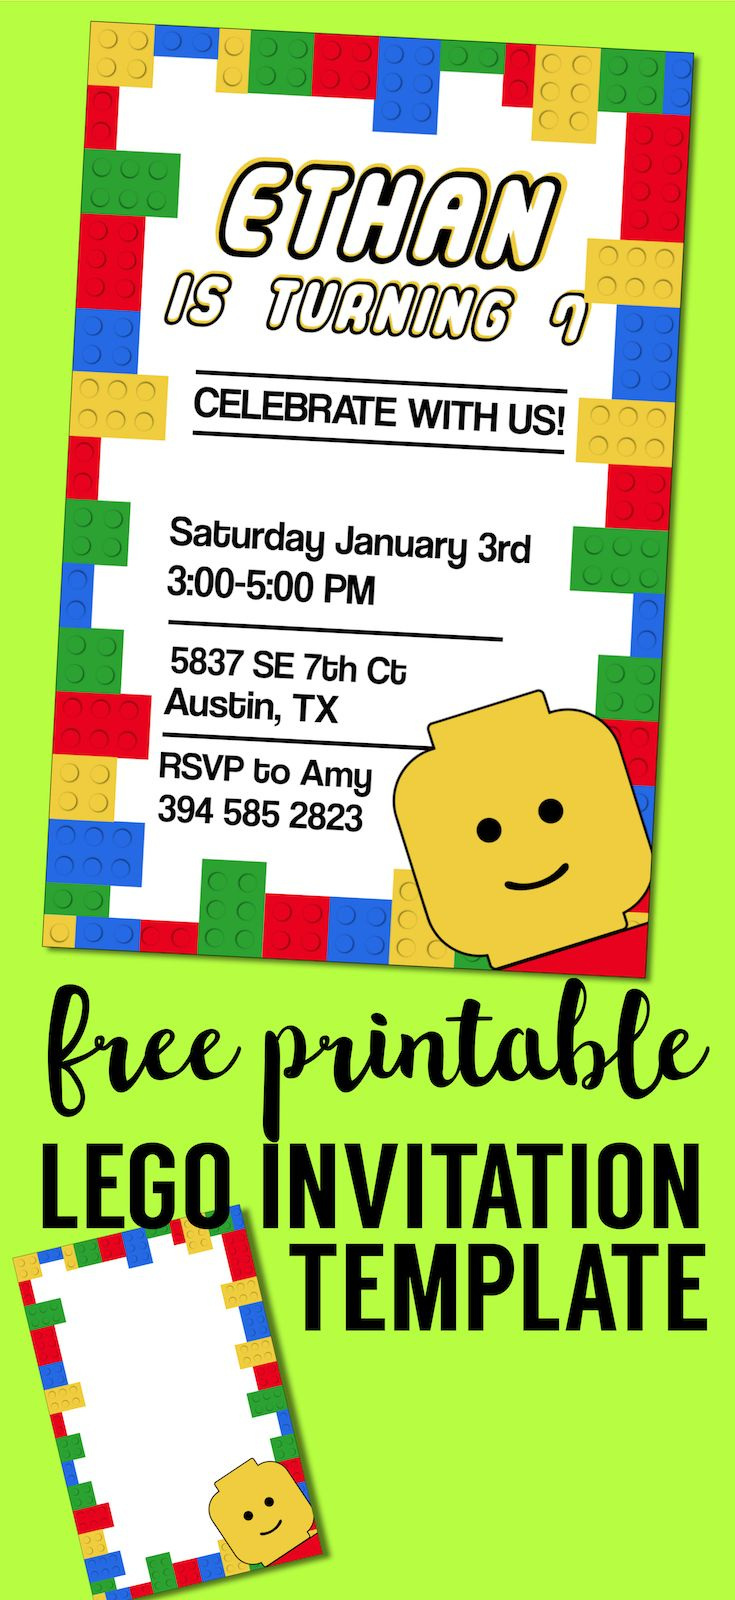 Free Printable Lego Birthday Party Invitation Template Lego